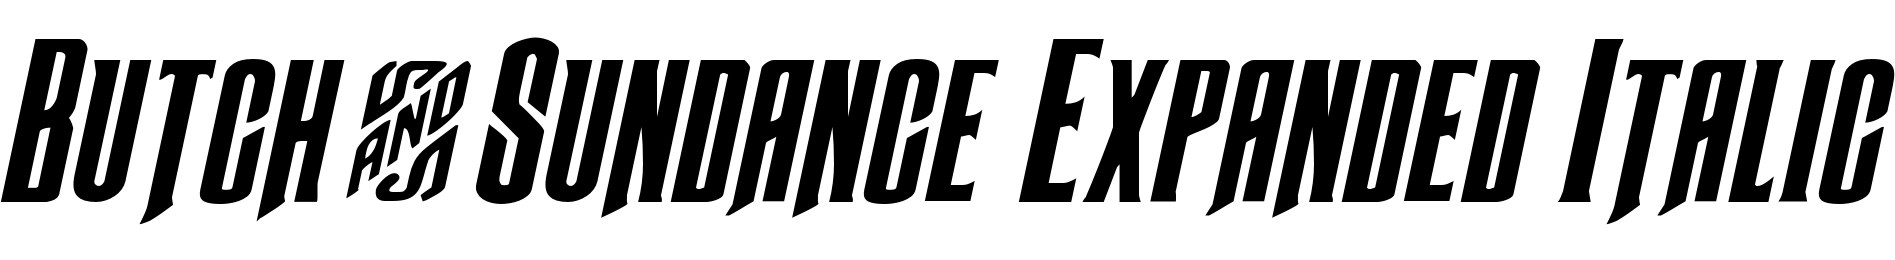 Butch & Sundance Expanded Italic